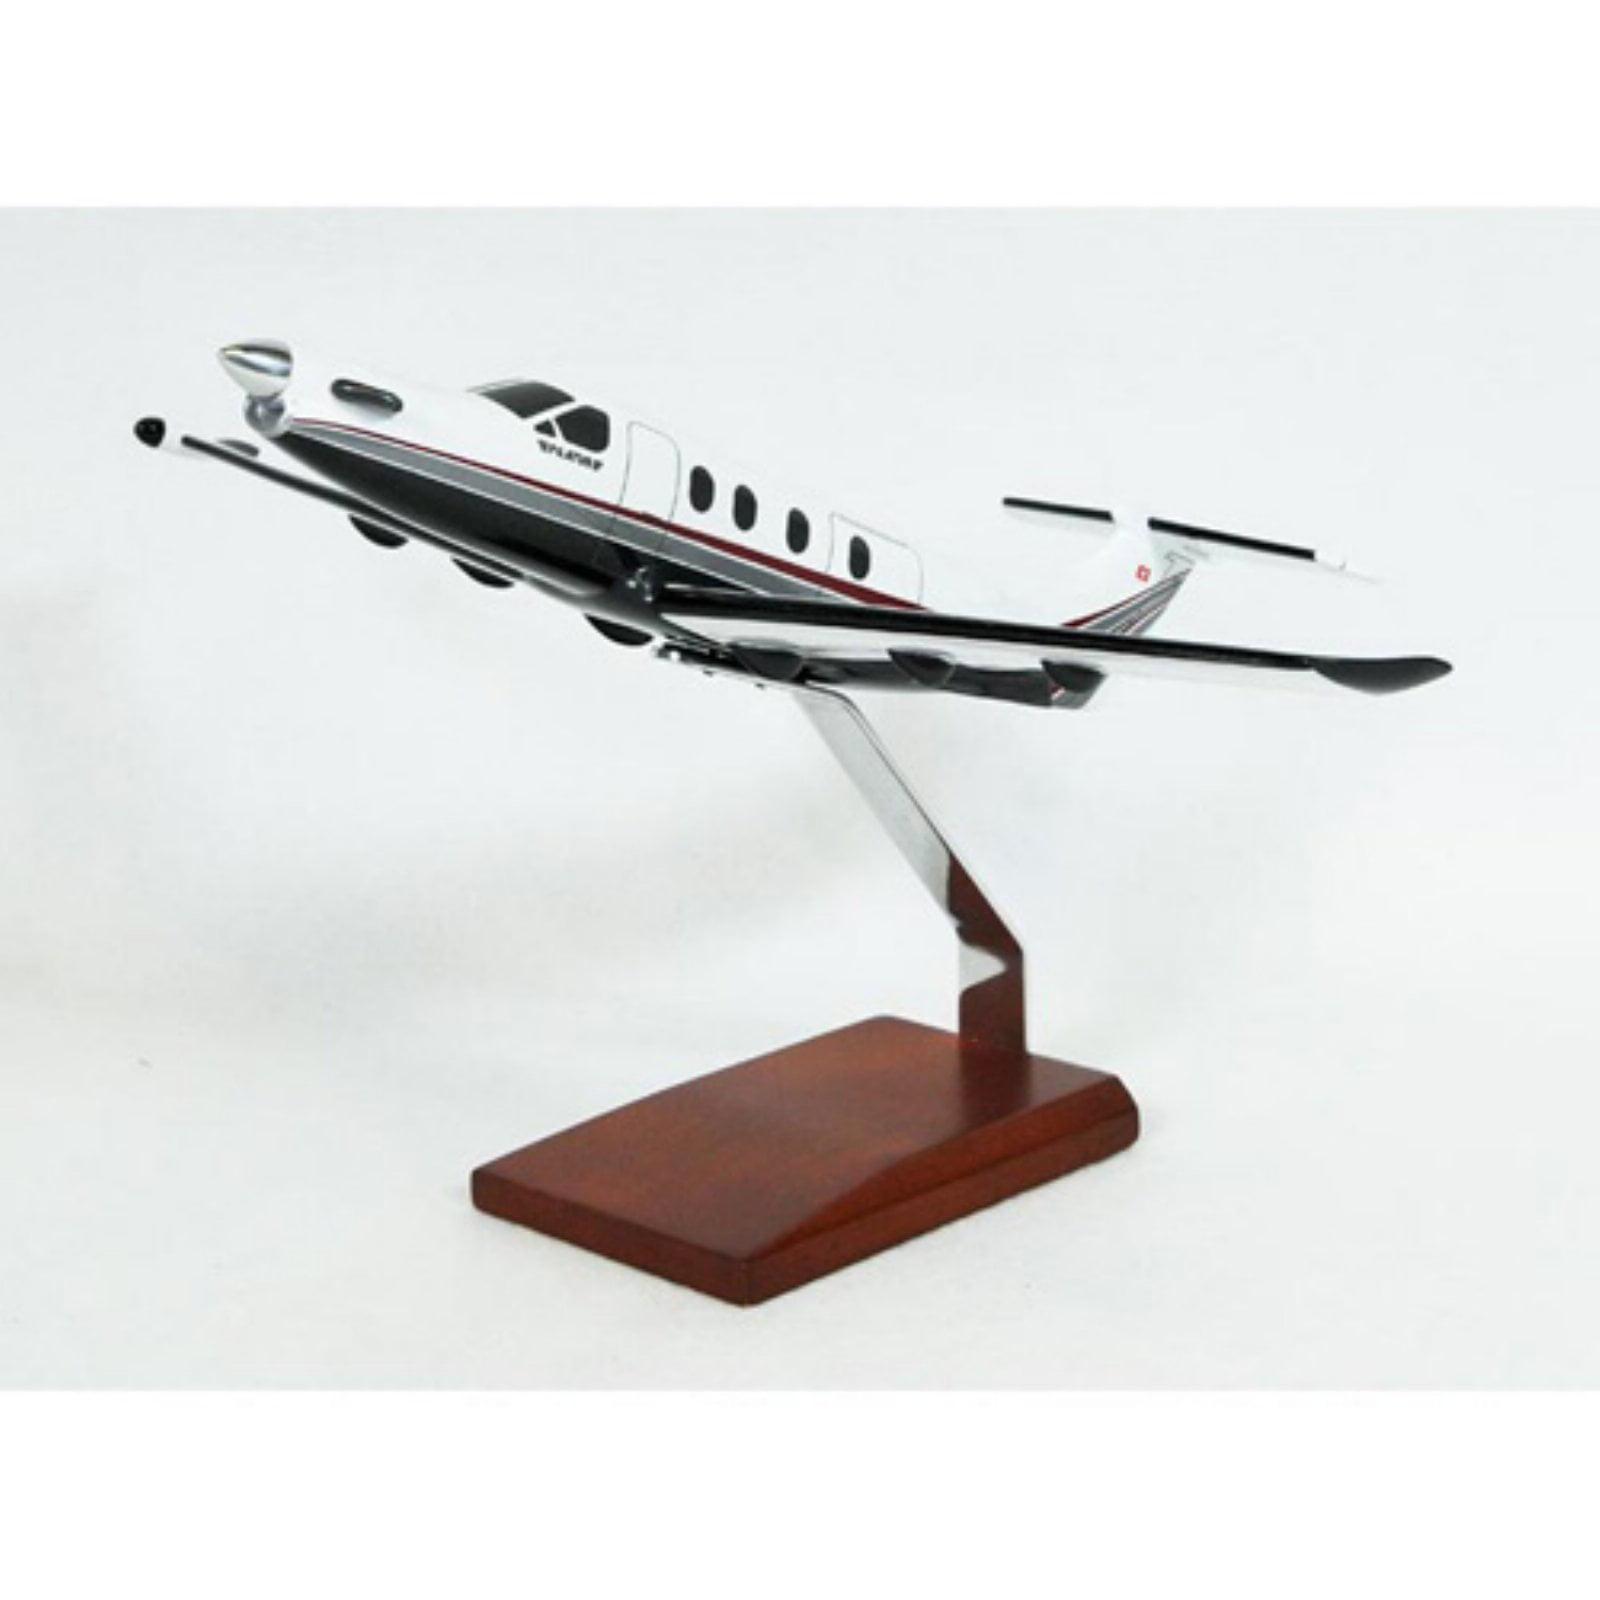 Daron Worldwide Pilatus PC-12 Pinnacle Model Airplane by DARON